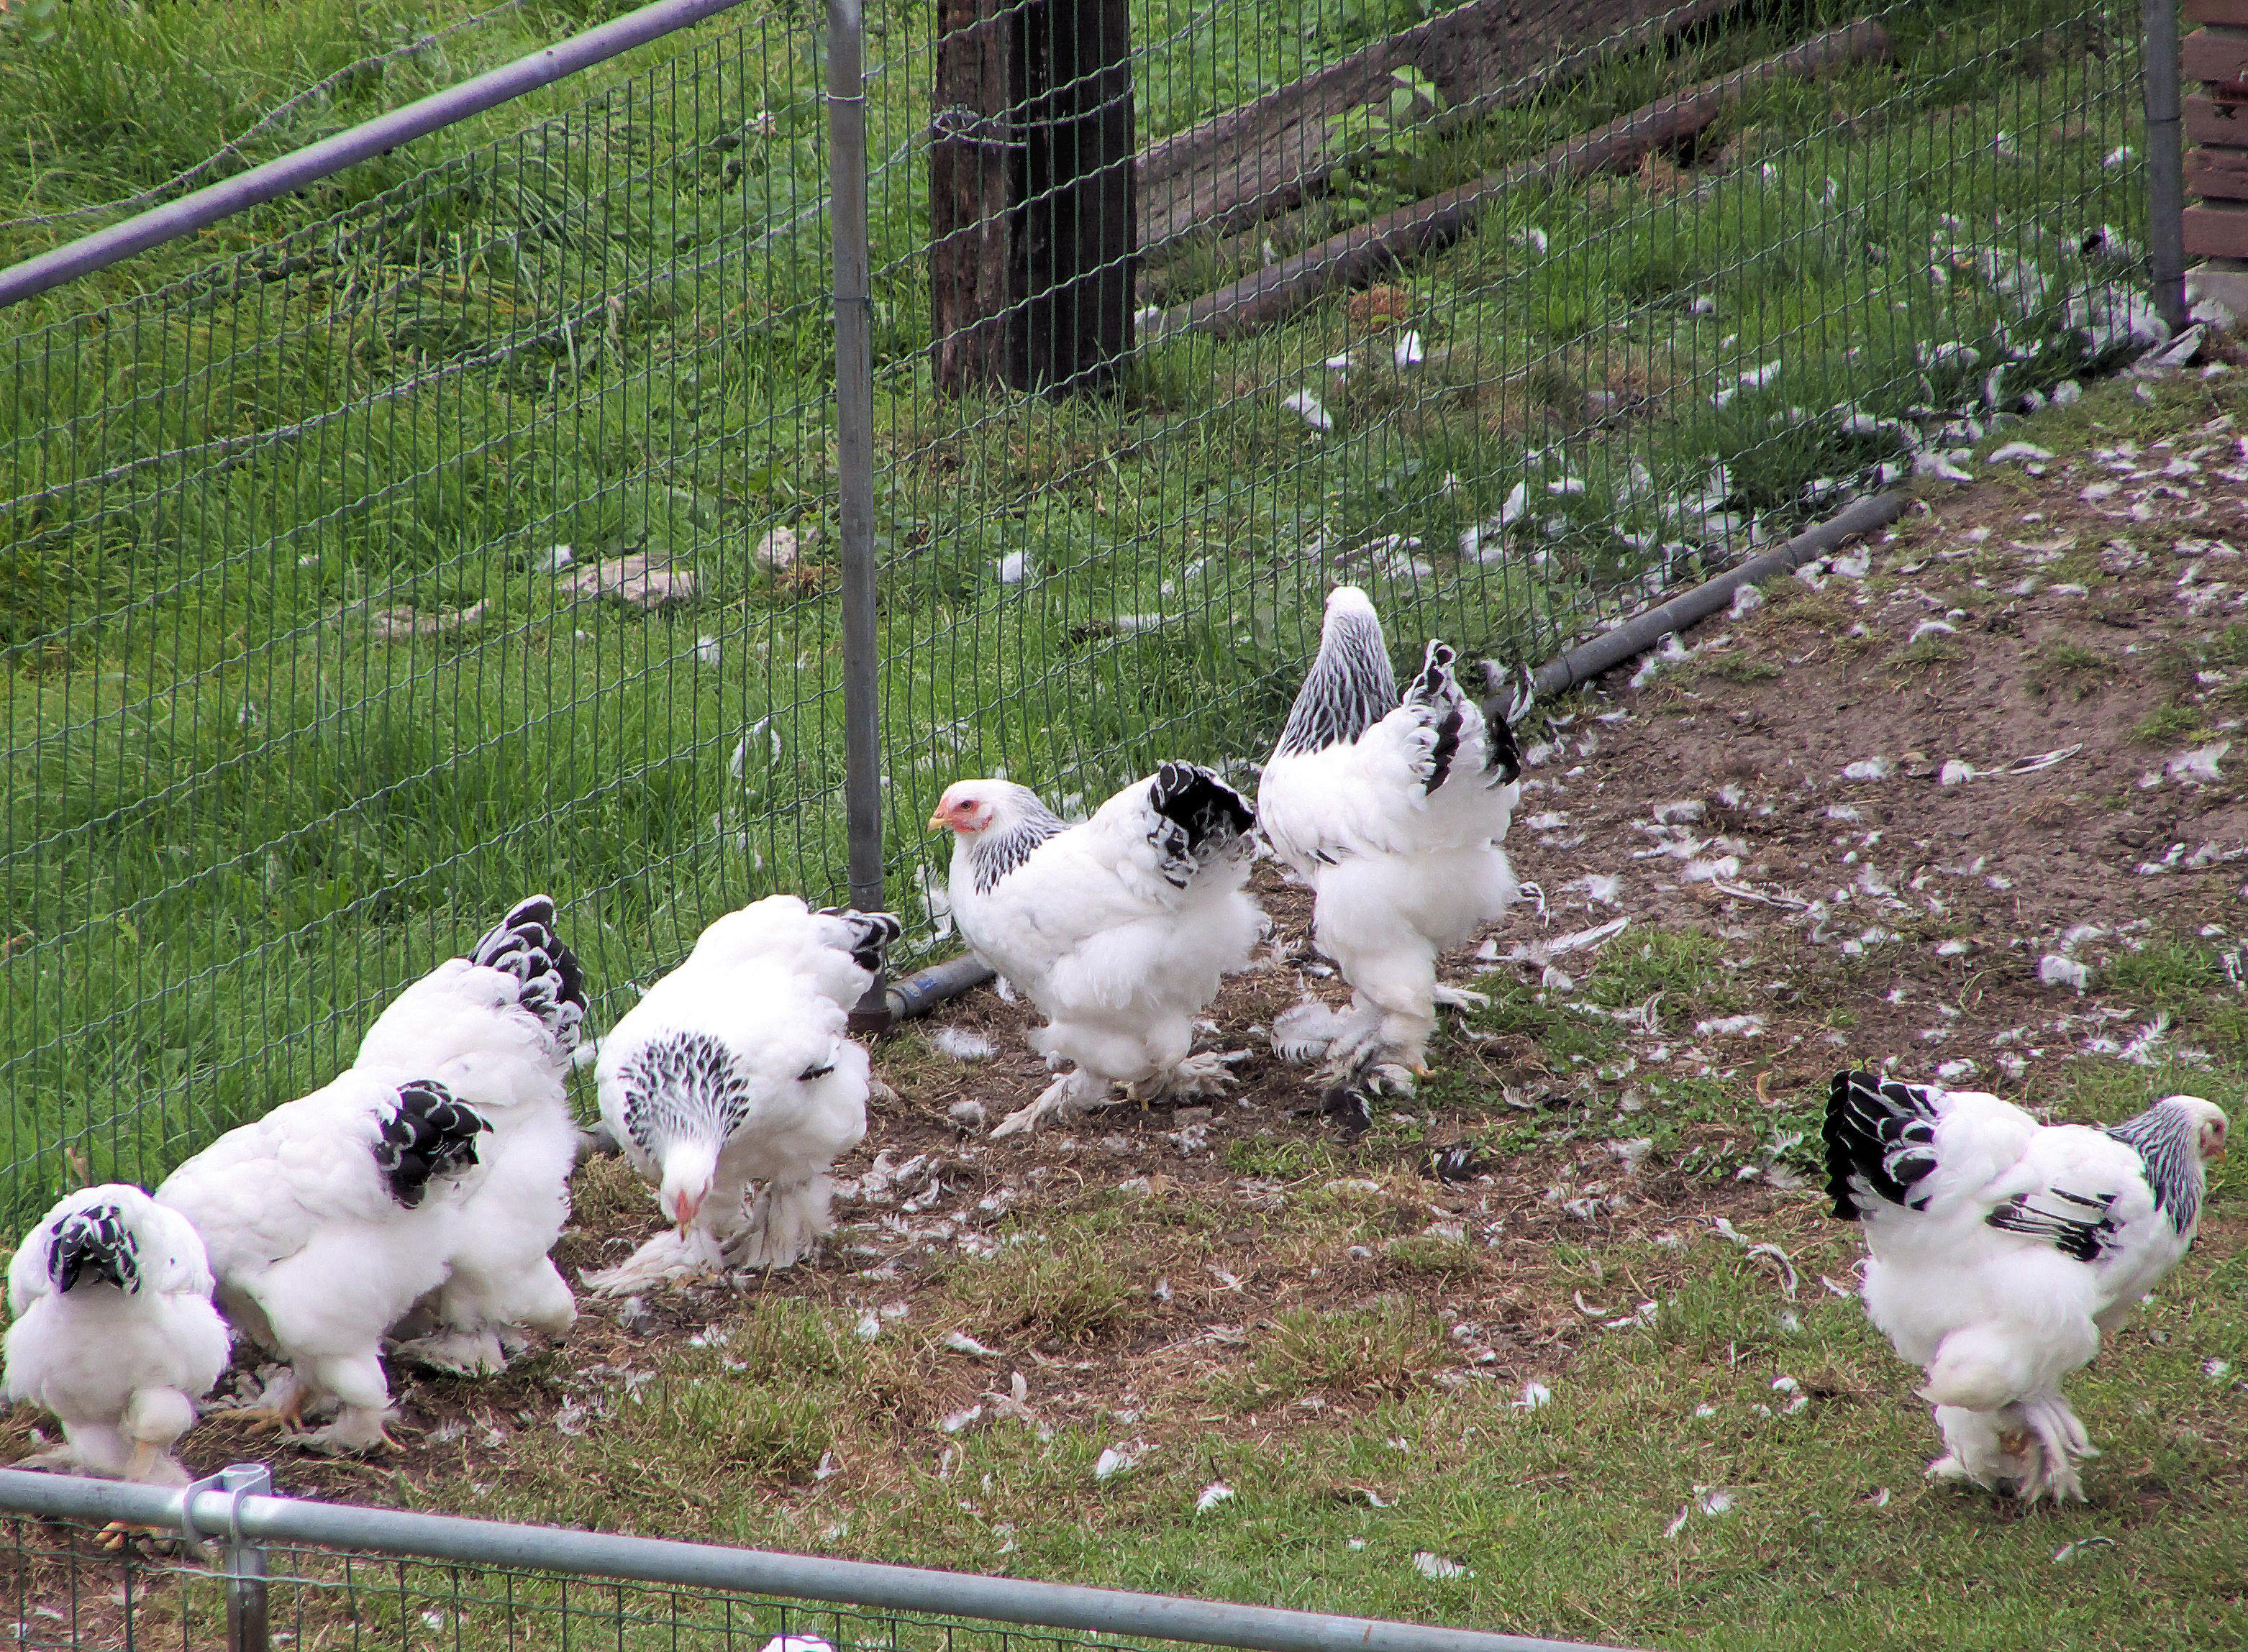 File:Brahma kippen, witcolumbia zwart getekend.jpg